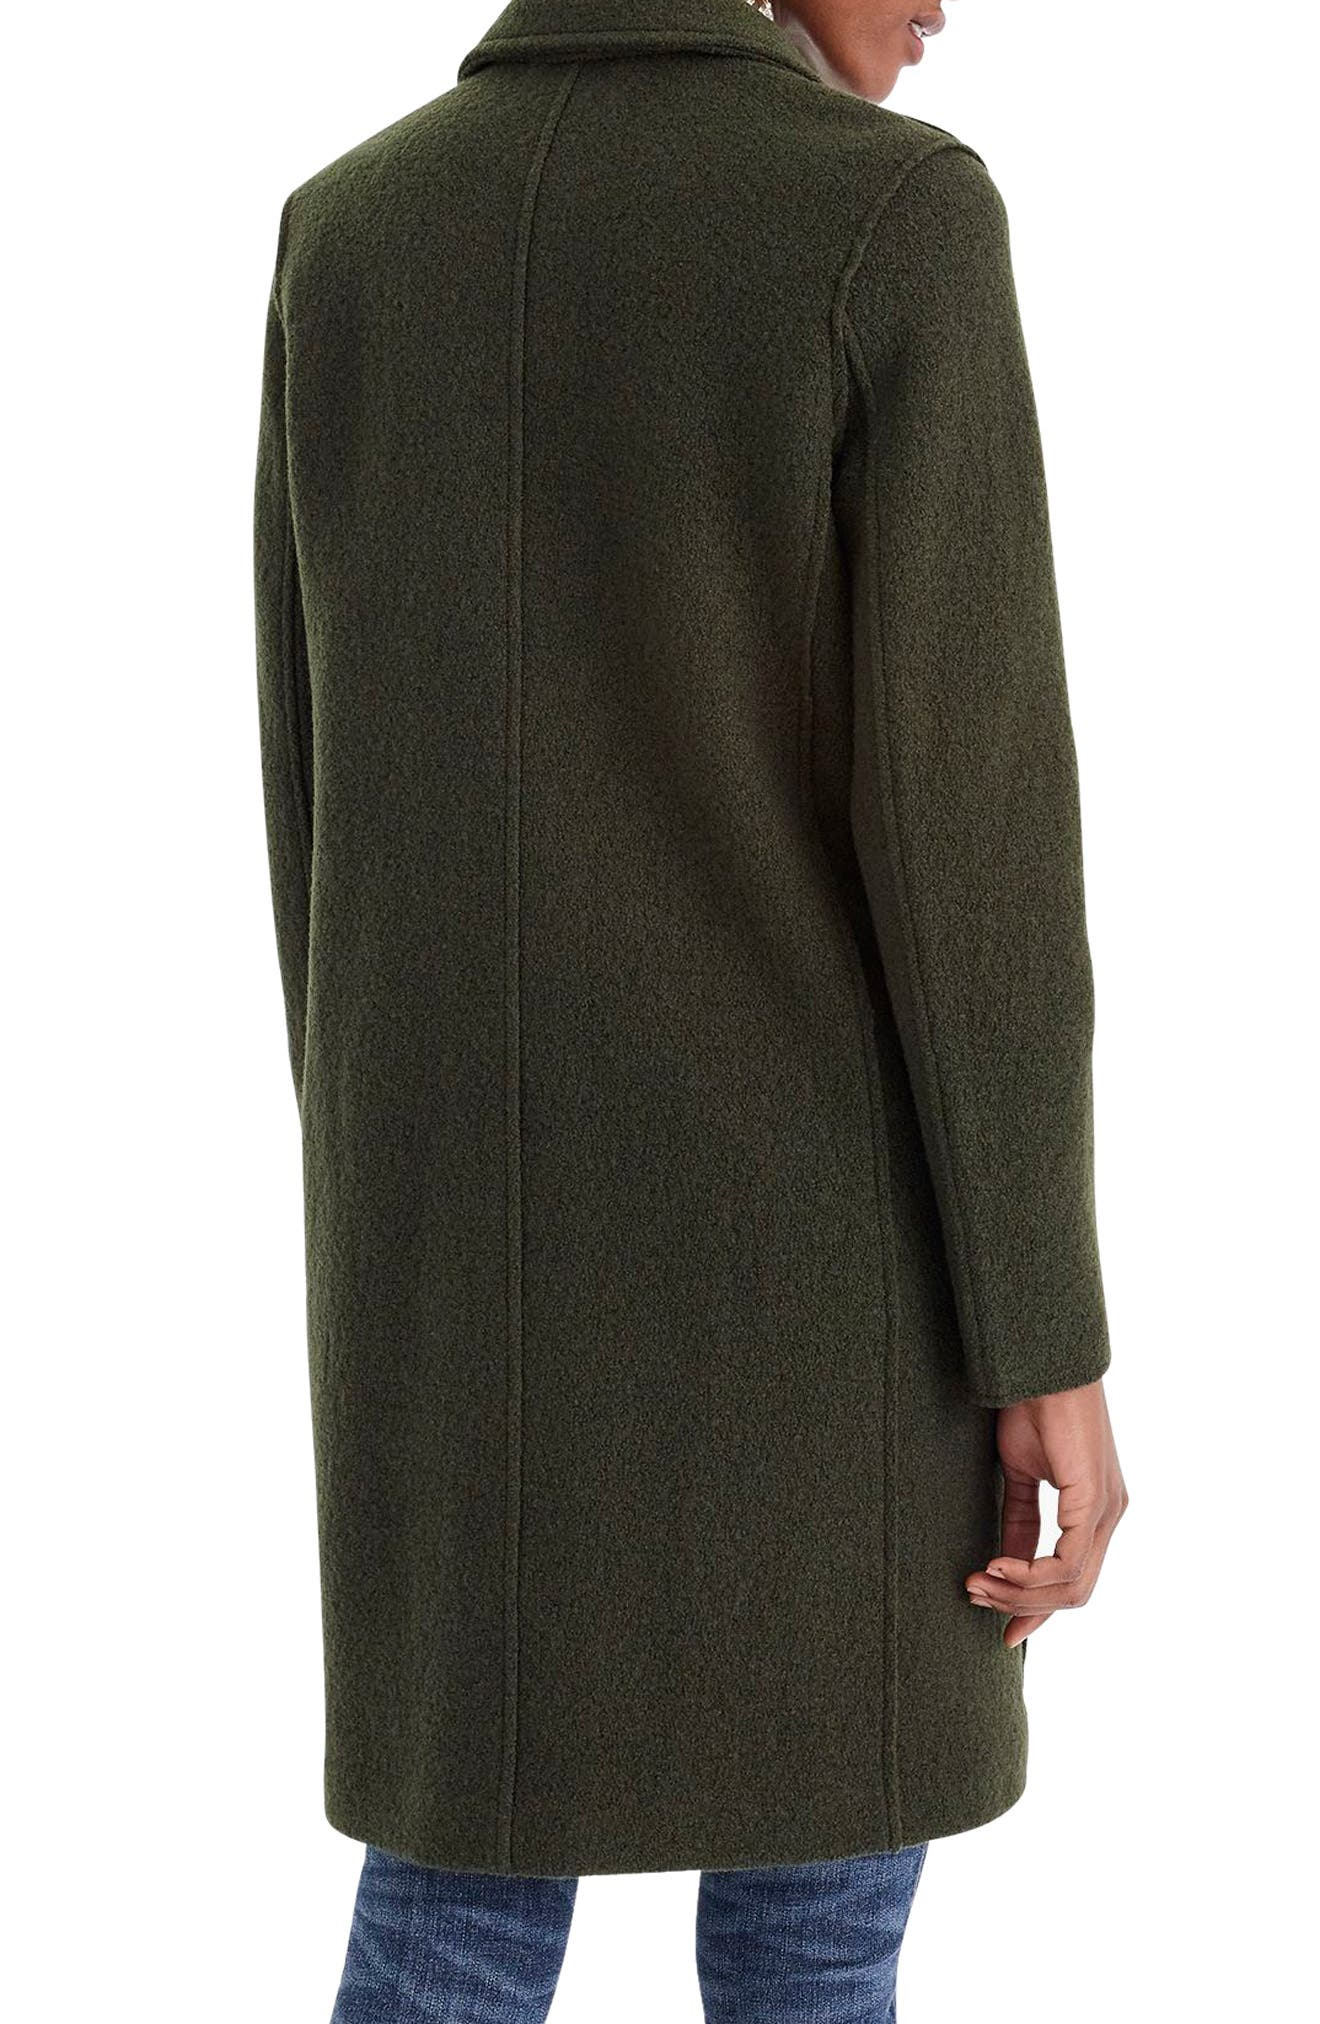 J.CREW,                             Daphne Boiled Wool Topcoat,                             Alternate thumbnail 2, color,                             301